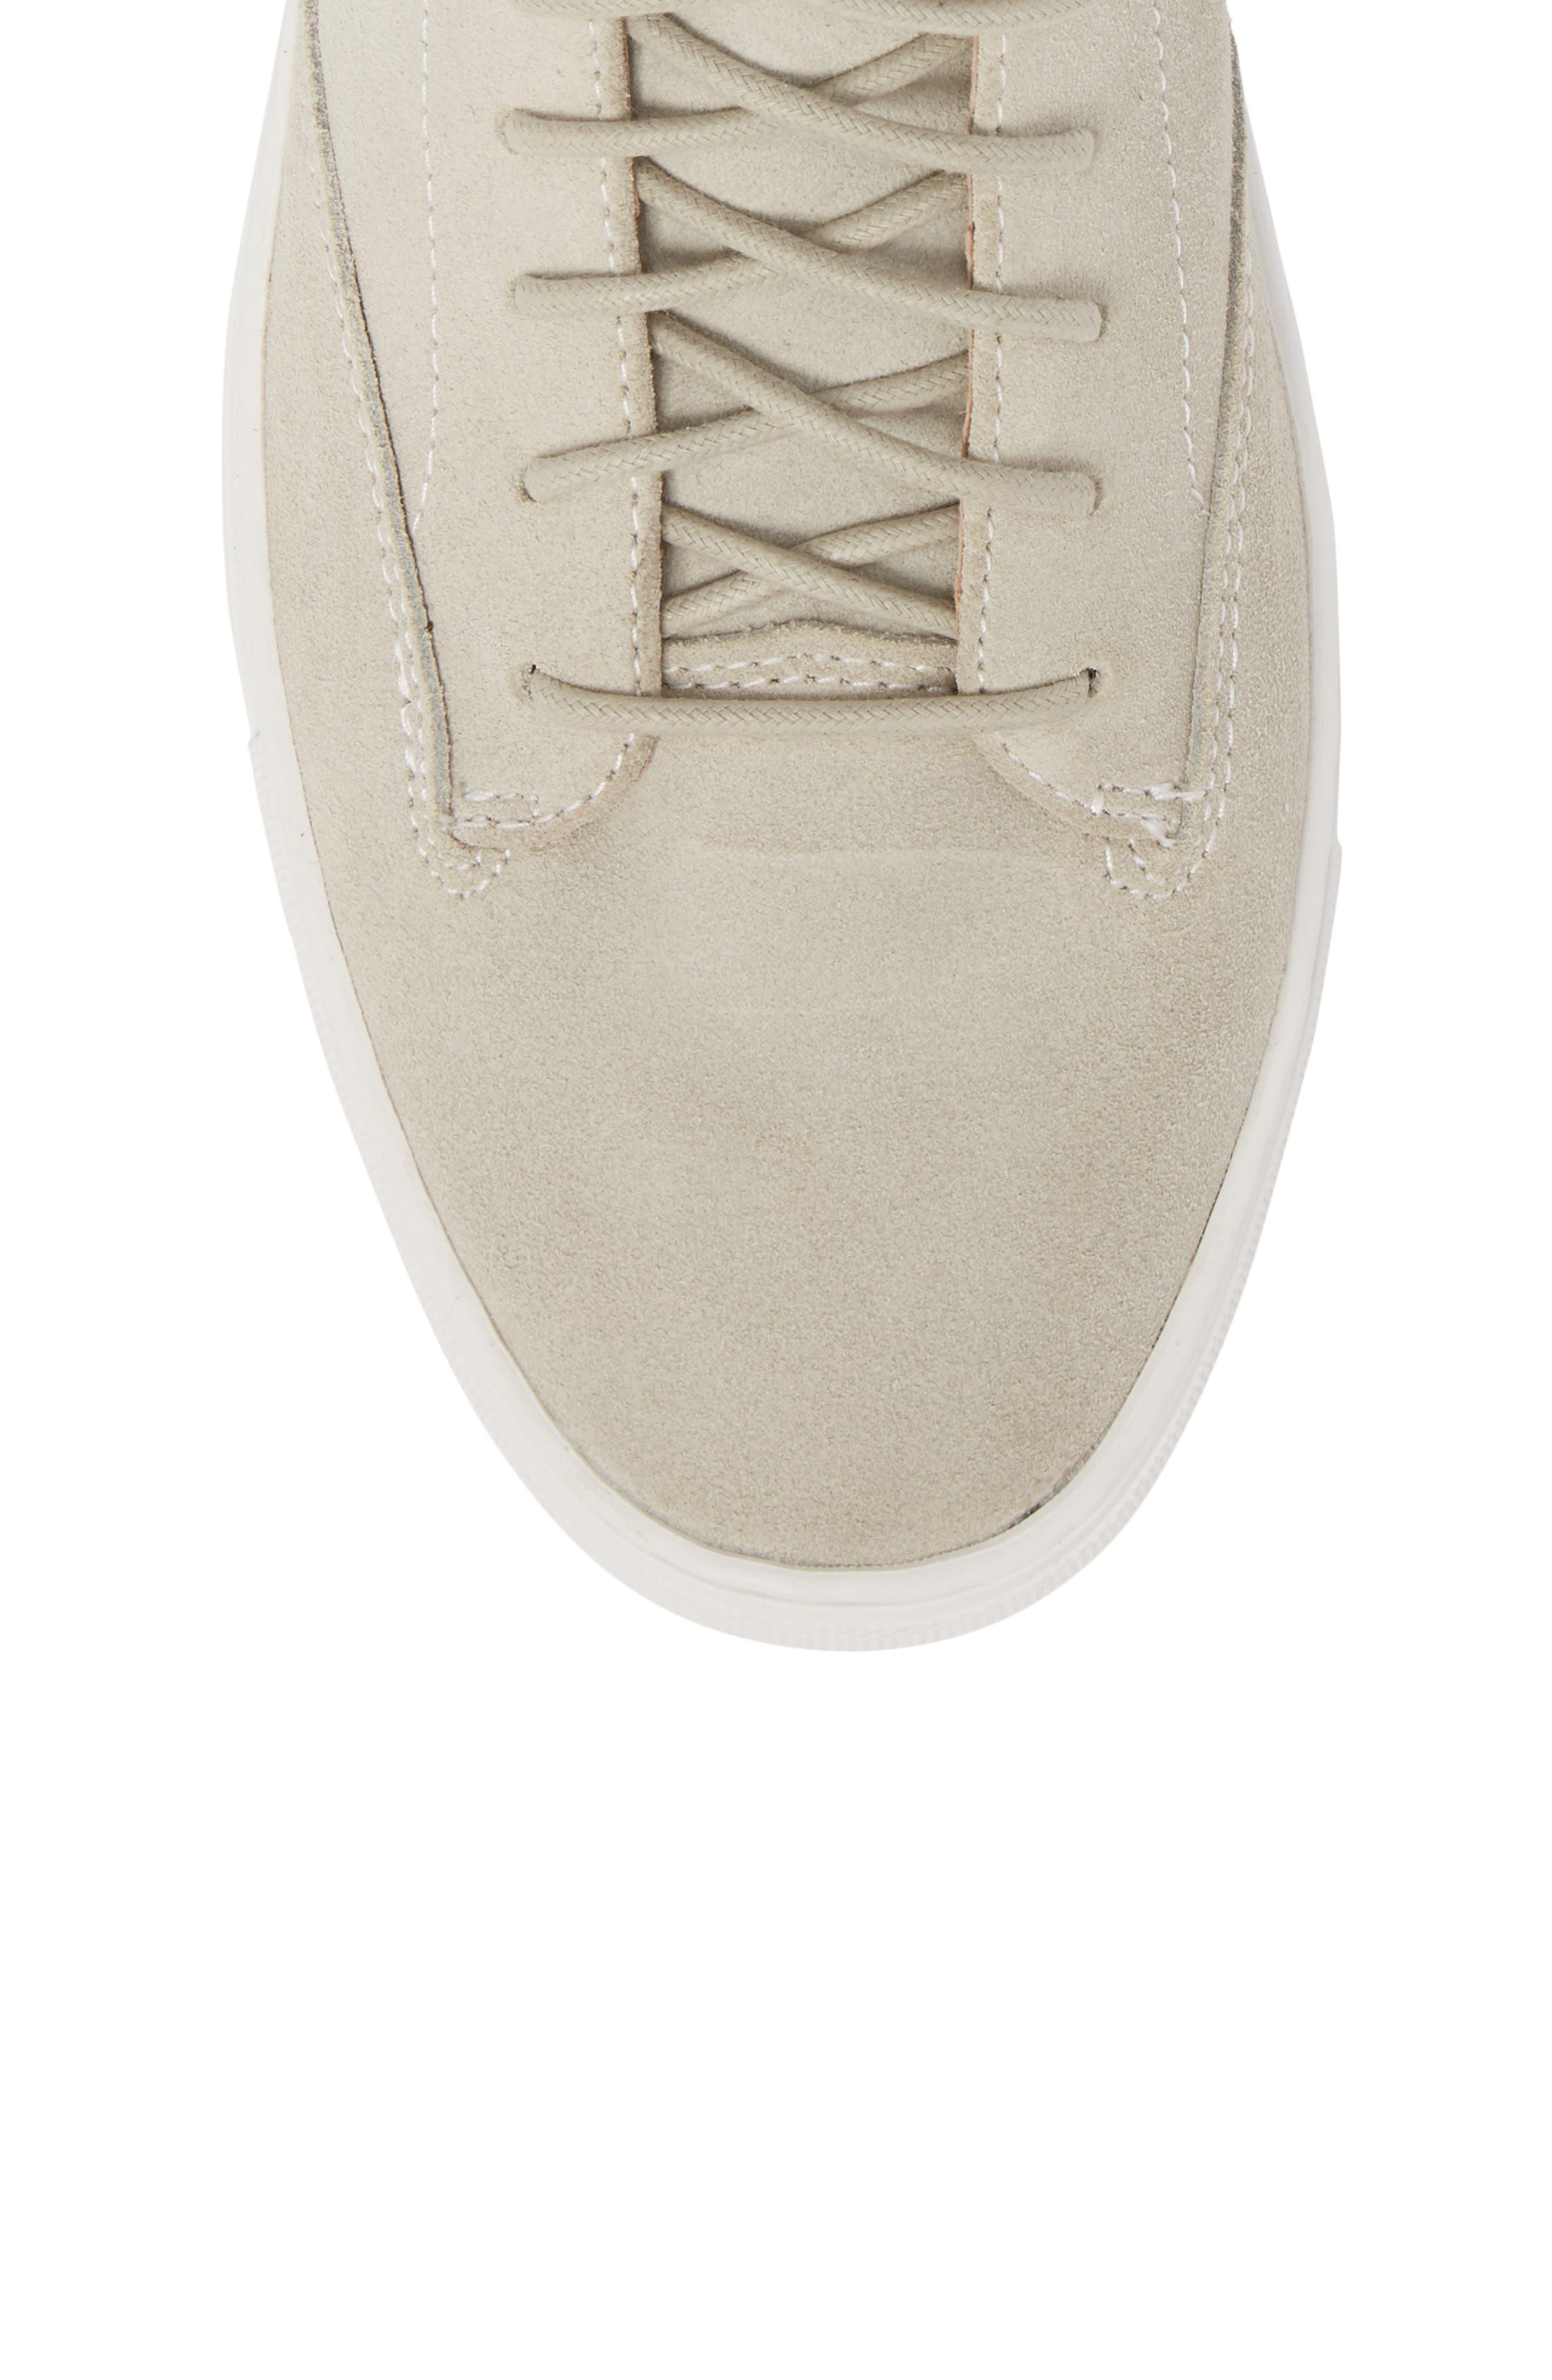 'Porter' High Top Sneaker,                             Alternate thumbnail 5, color,                             Quartz Leather